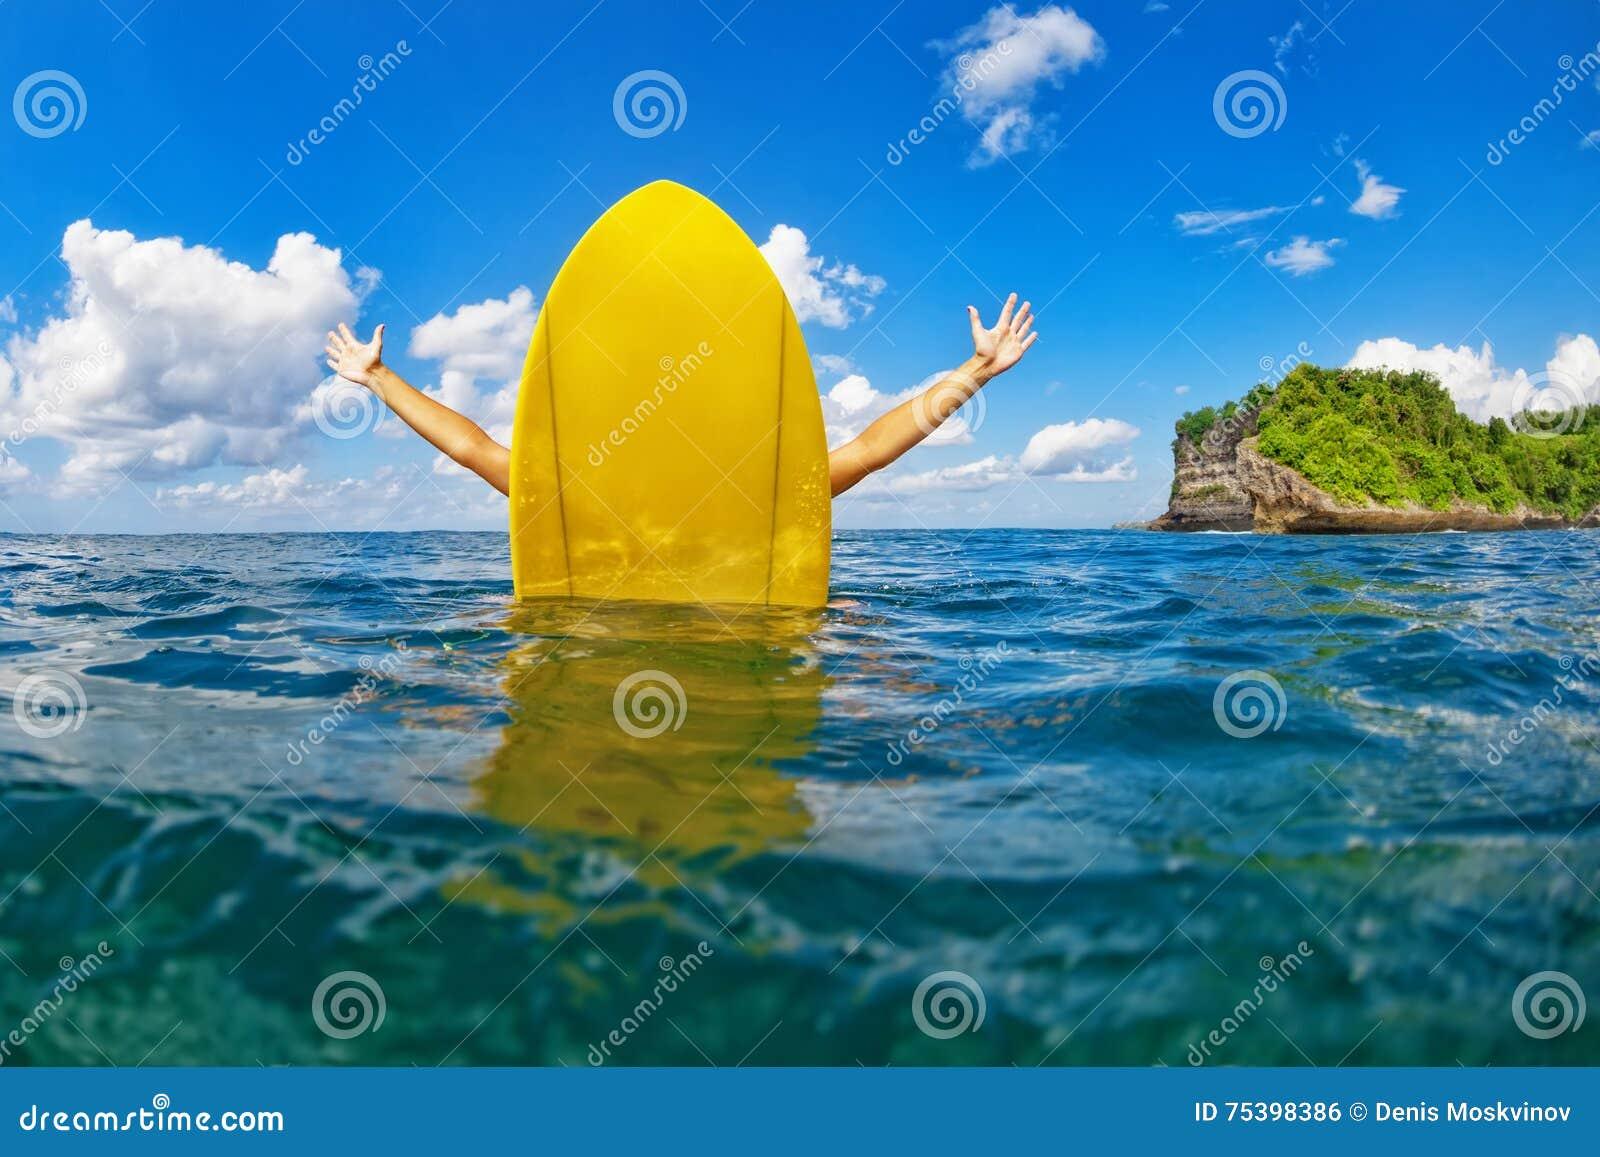 A menina feliz do surfista senta-se na prancha amarela no oceano